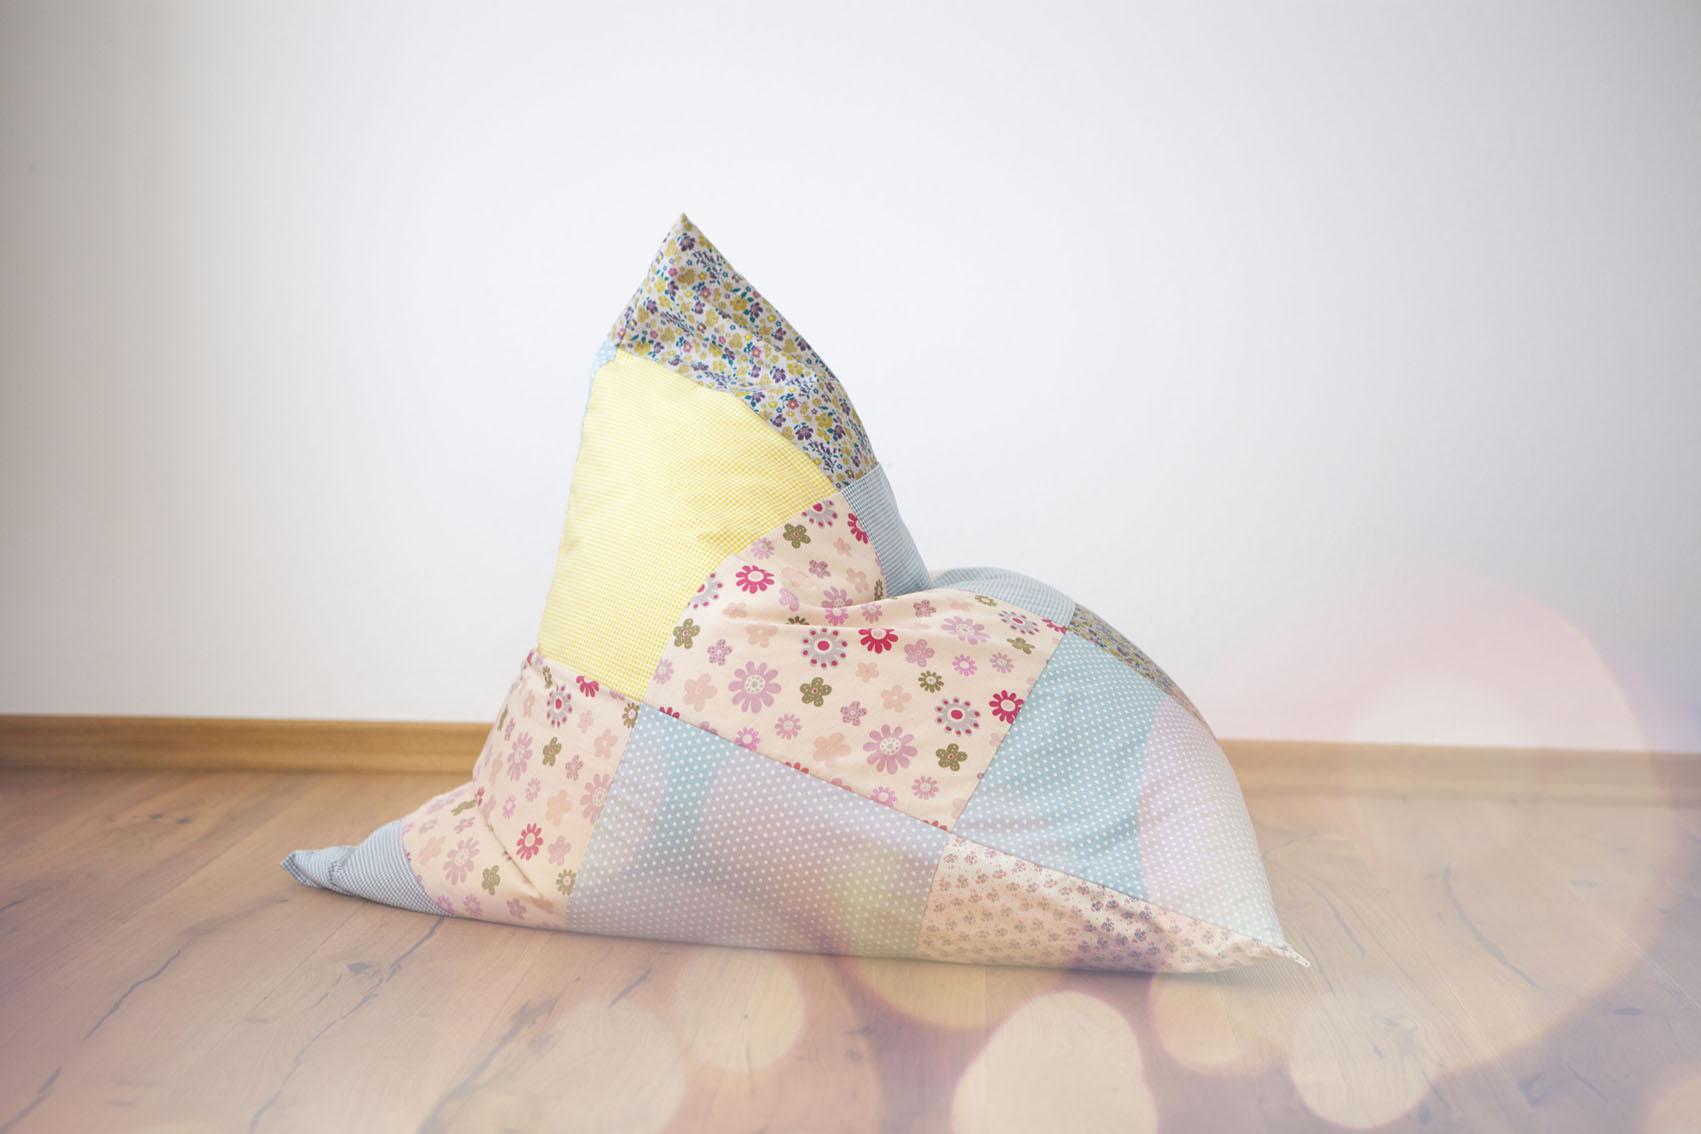 diy patchwork sitzsack in pastellt nen c pauli nature blog. Black Bedroom Furniture Sets. Home Design Ideas